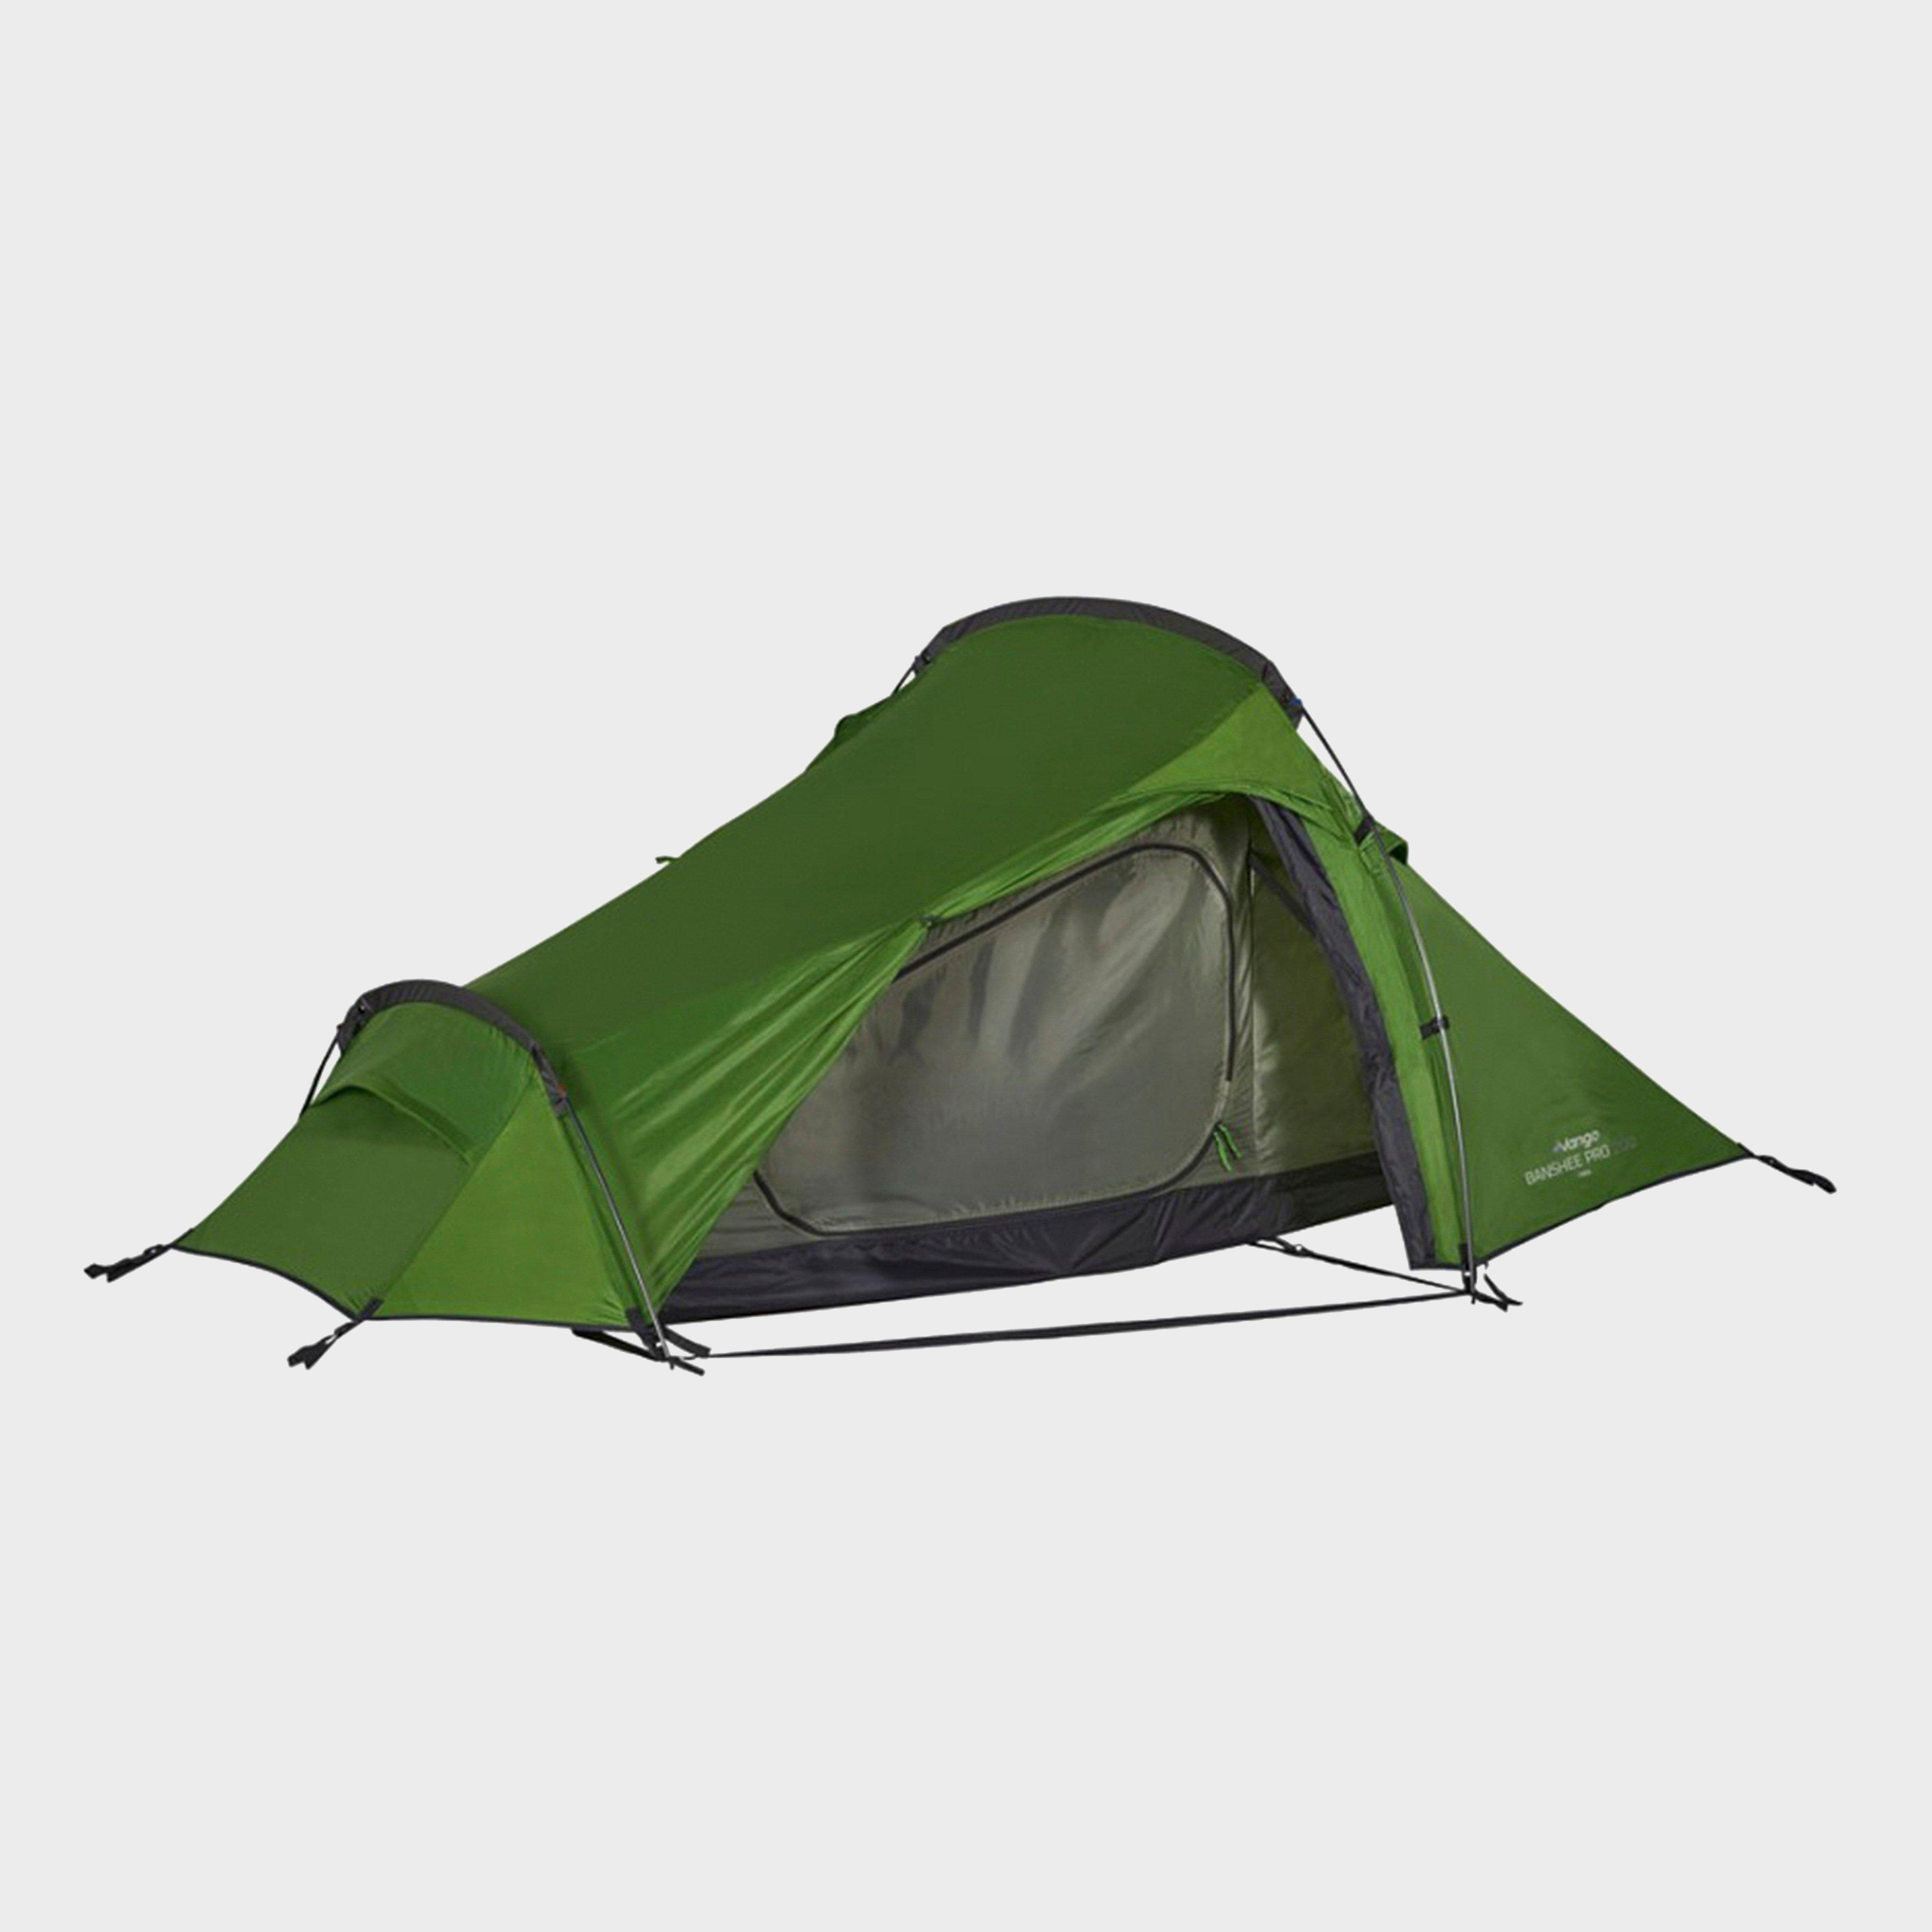 Vango Pop 300 Dlx 3 Man Person Cing Up Dome Tent Black & Vango Pop 300 Dlx 3 Man Up Tent - Best Tent 2018